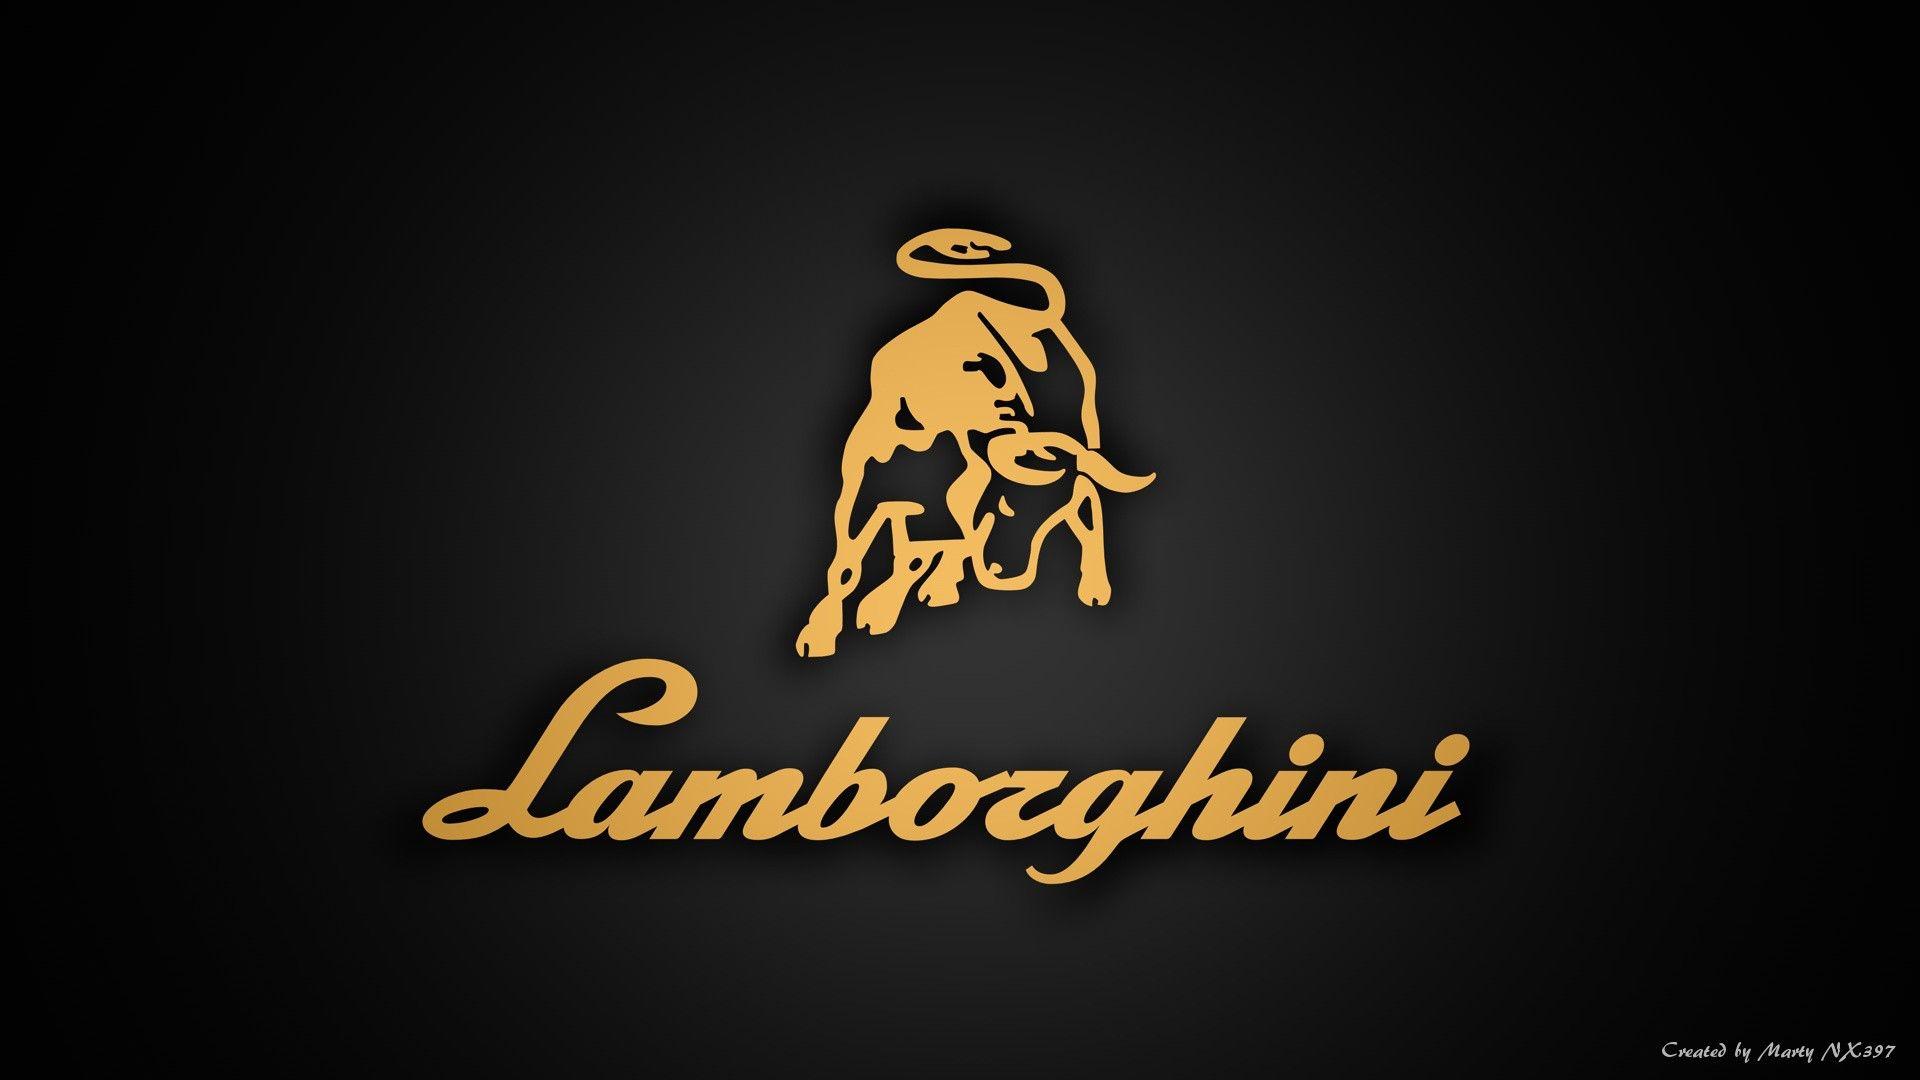 hd lamborghini logo Pictures Of Cars Hd 640×1136 Lamborghini Logo ...